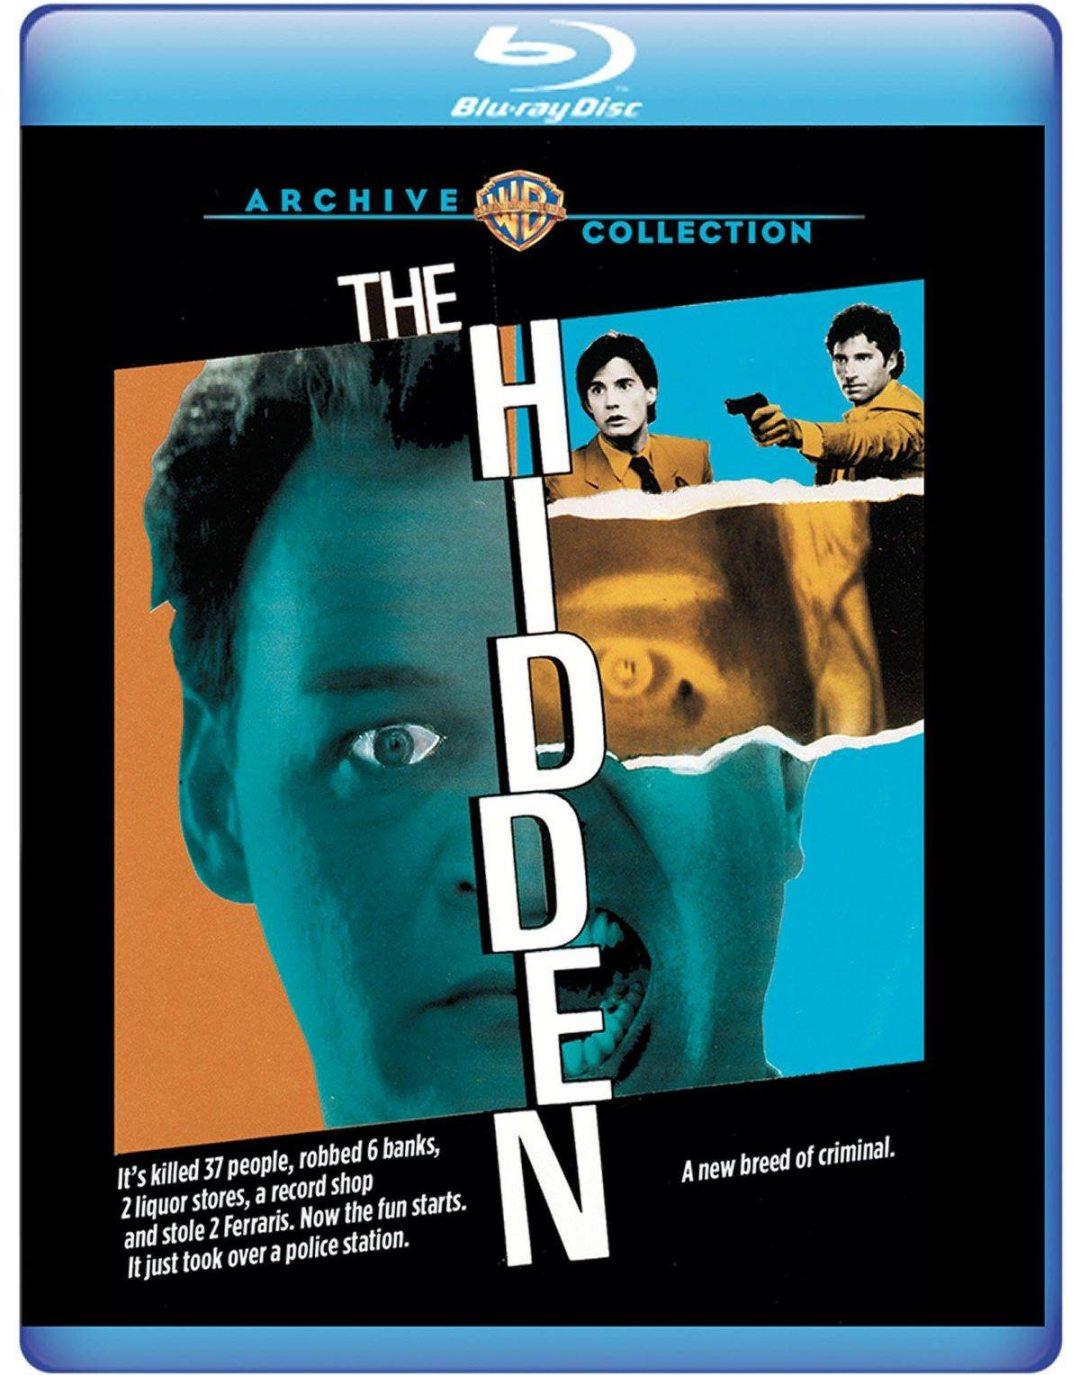 Warner Archive is Giving Us 'The Hidden'